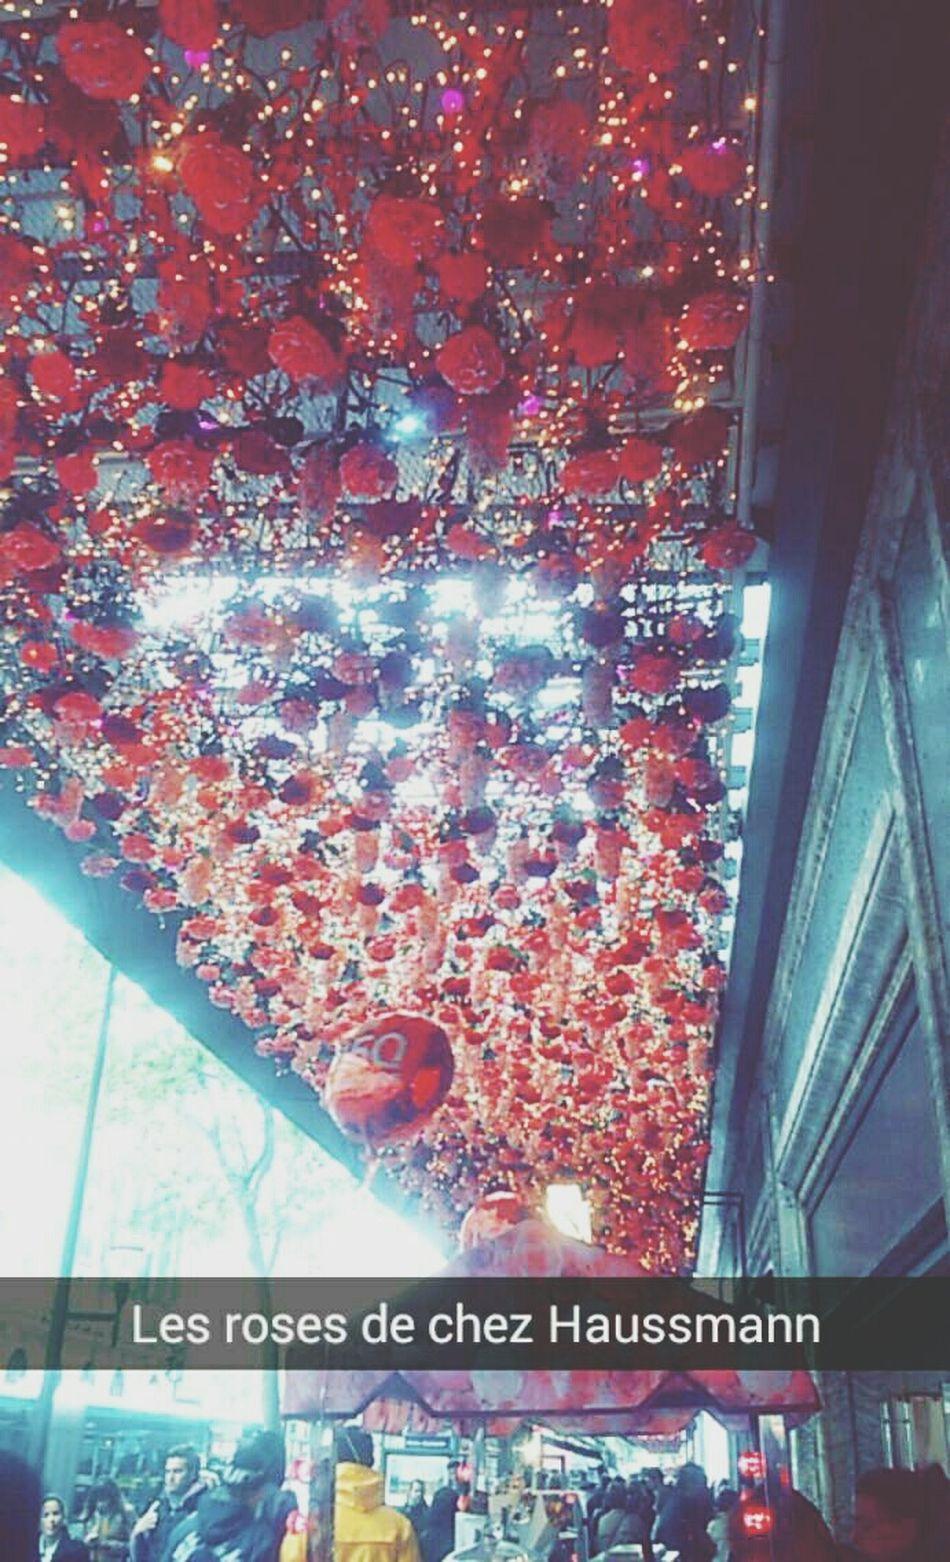 Petite balade sur le boulevard Haussmann Paris ❤ Haussmann Roses🌹 Pretty♡ Enjoying Life